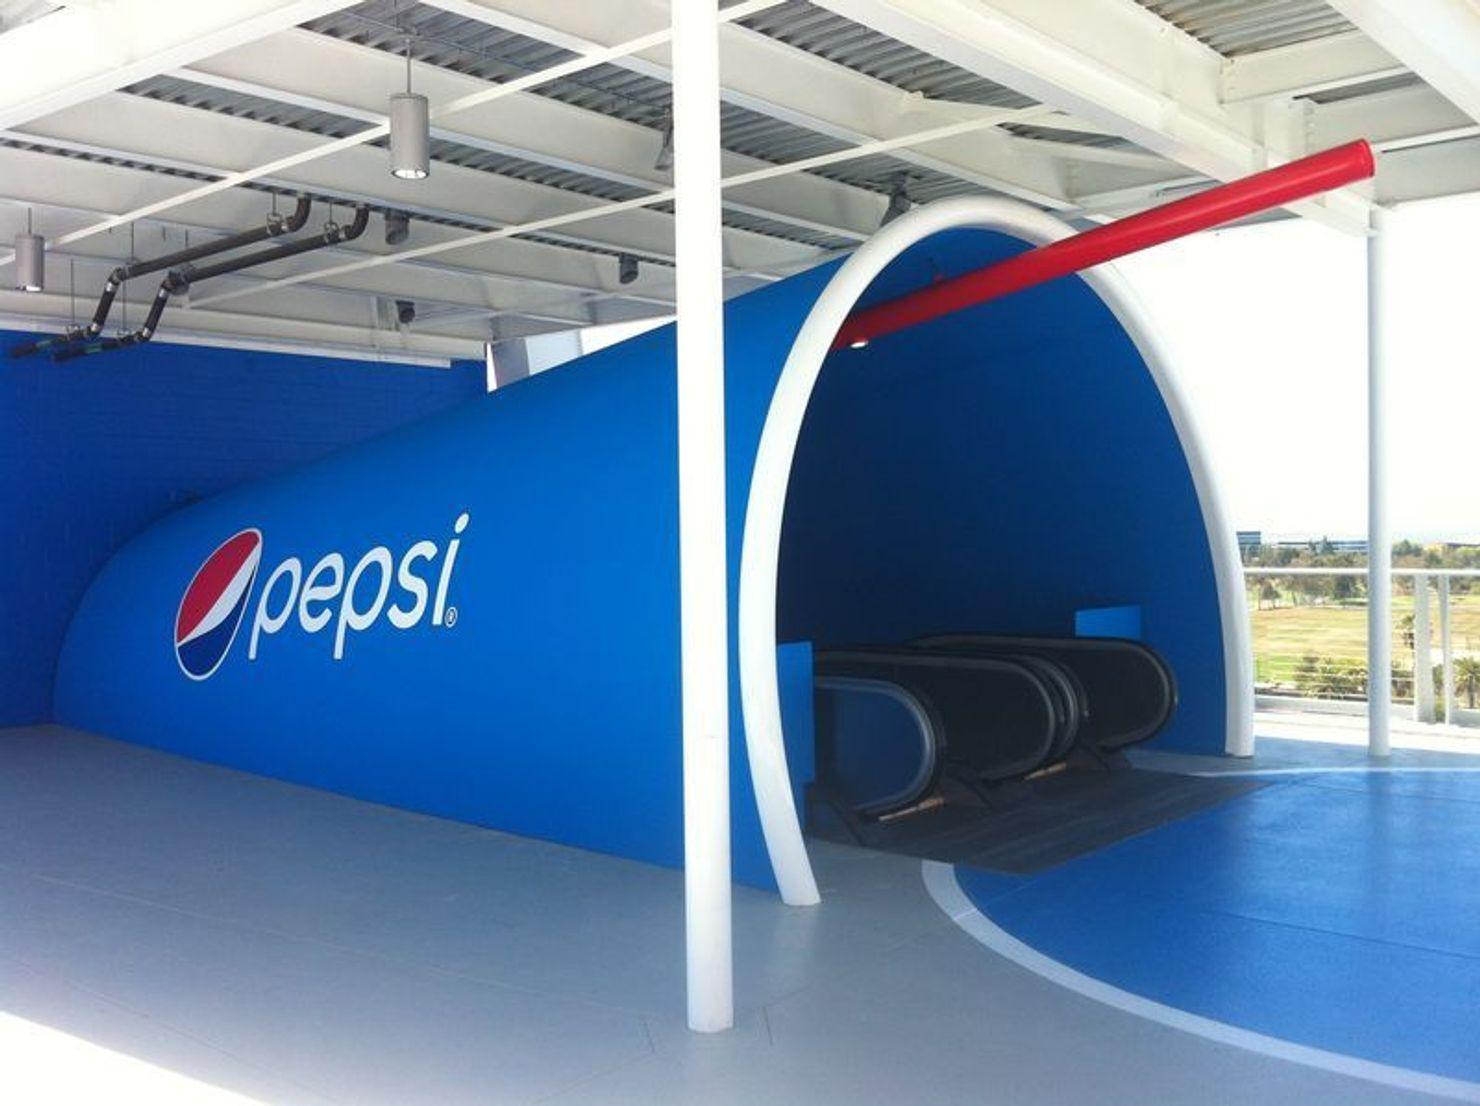 Image 1 for GPJ Experience Marketing and Pepsi Celebrate Clio Sports Award